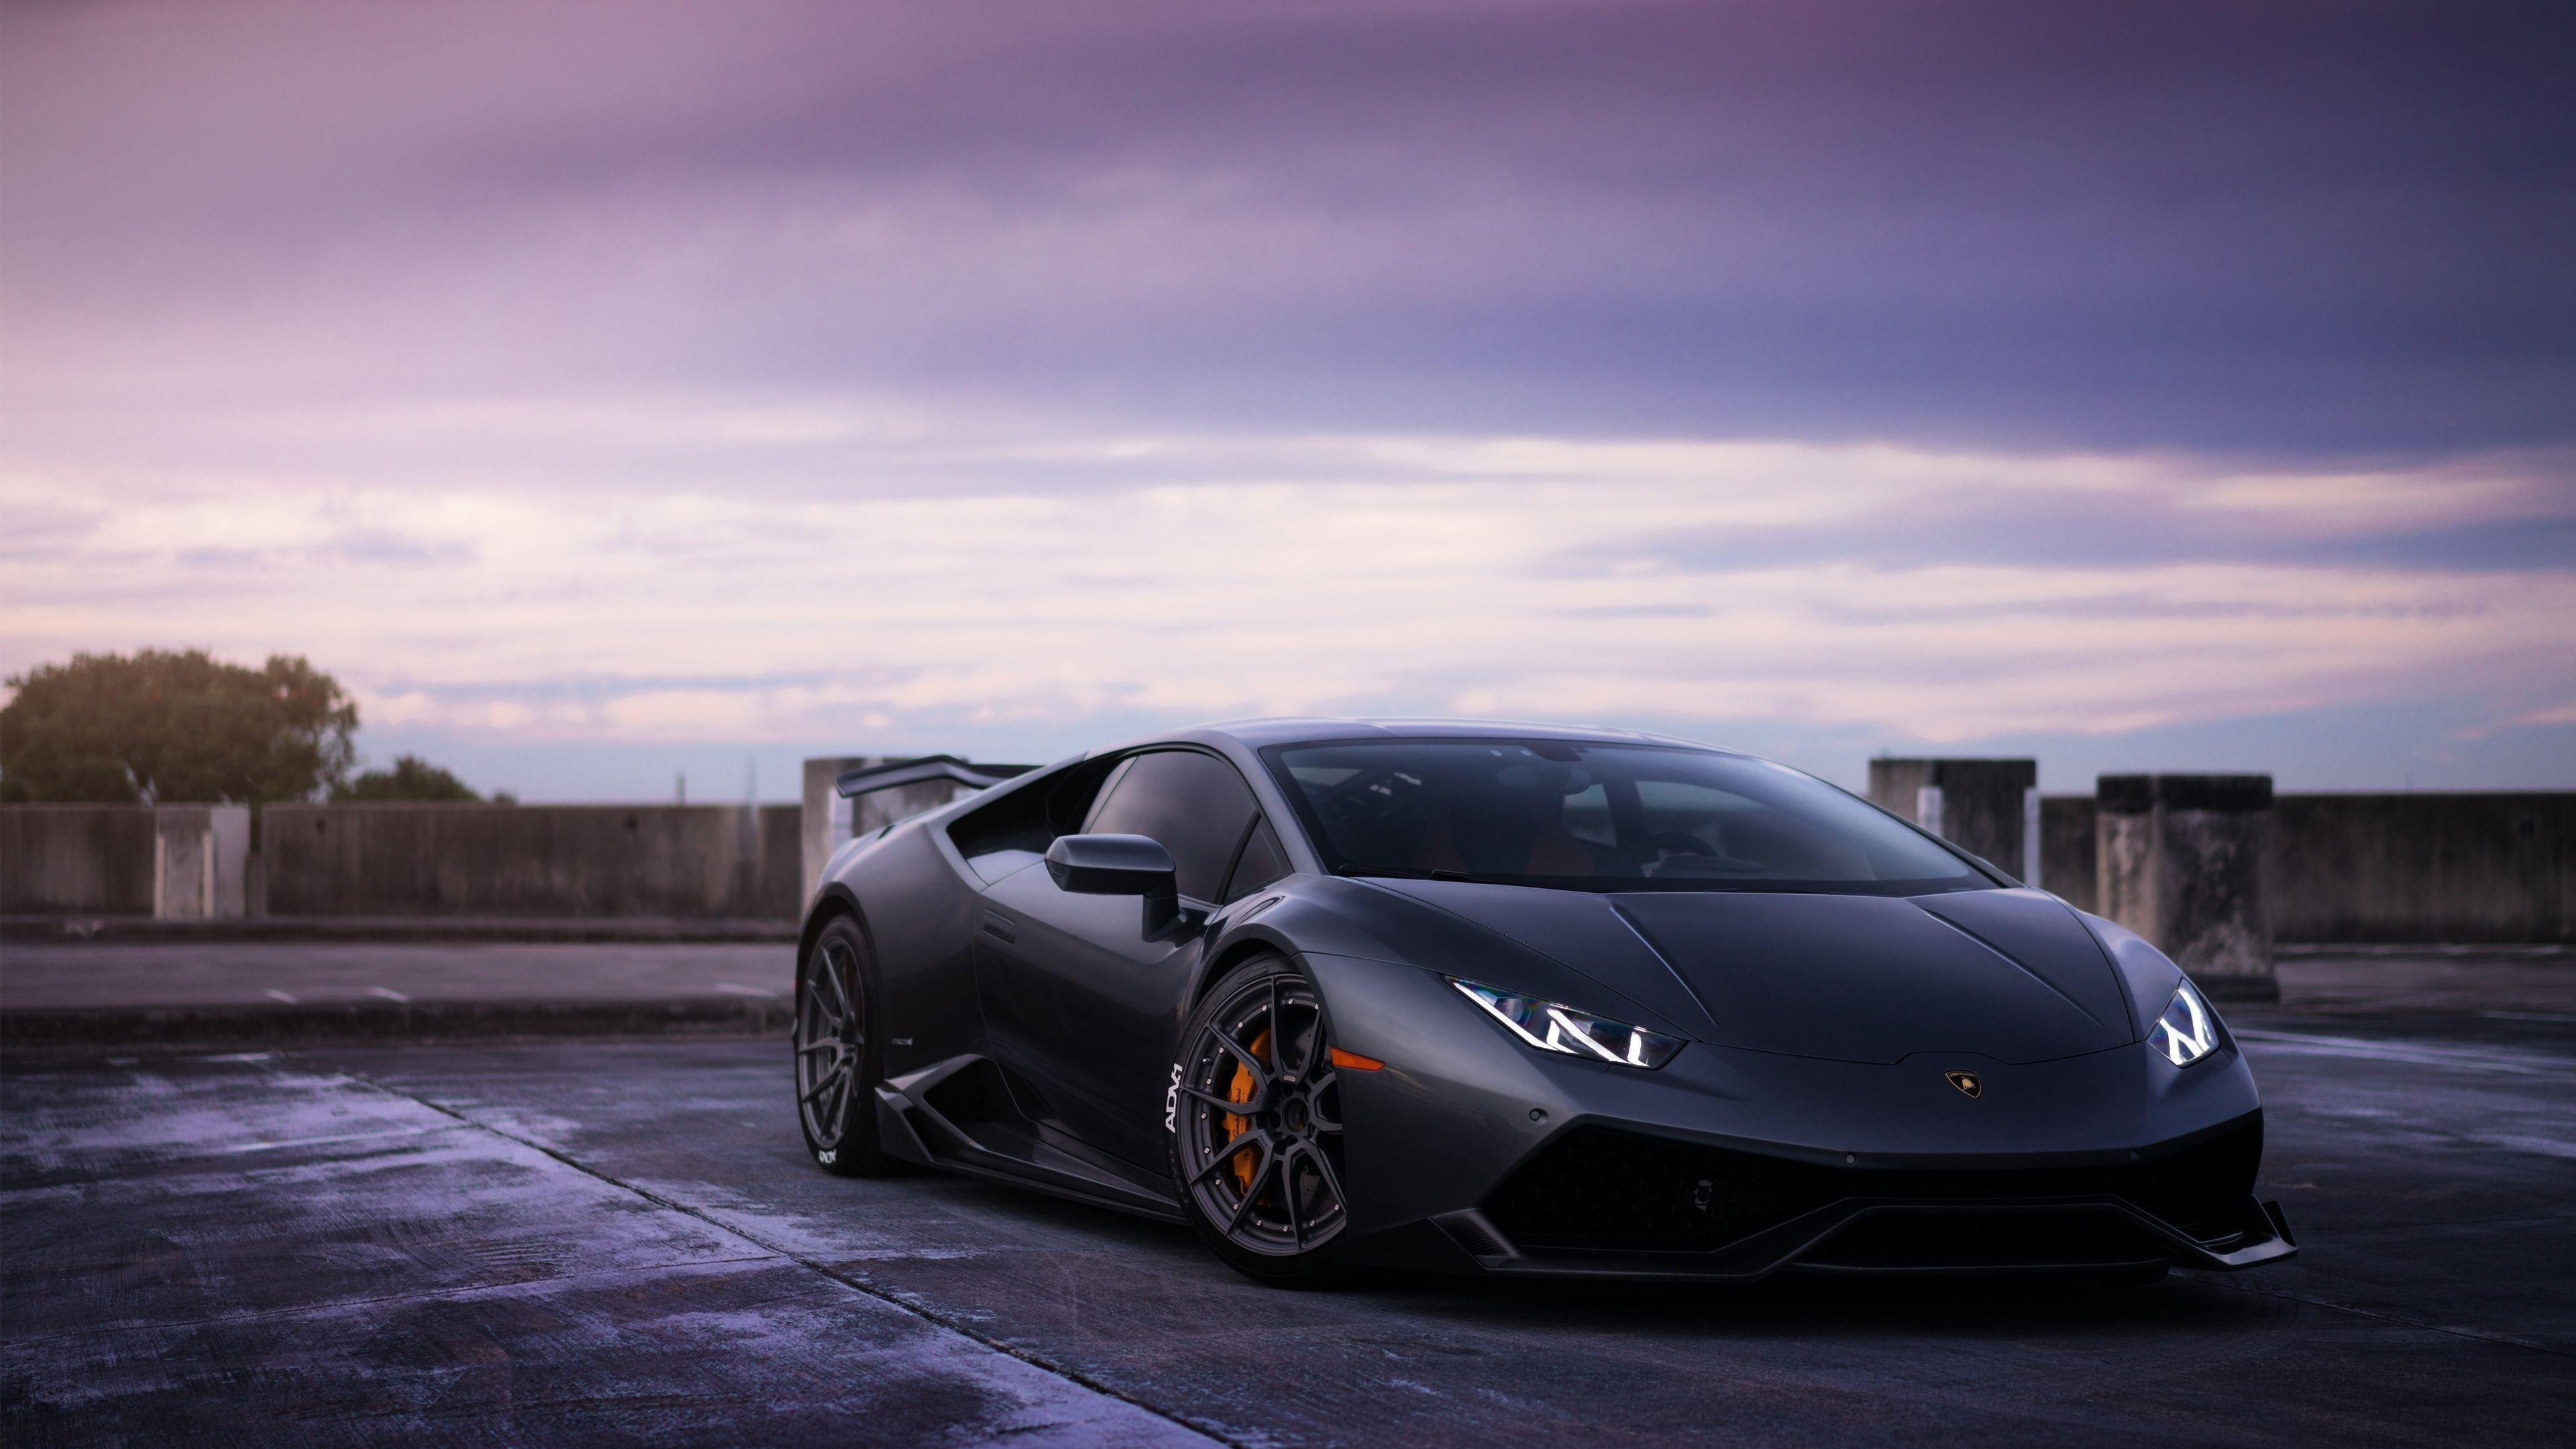 Custom Lamborghini 4k Wallpapers Top Free Custom Lamborghini 4k Backgrounds Wallpaperaccess